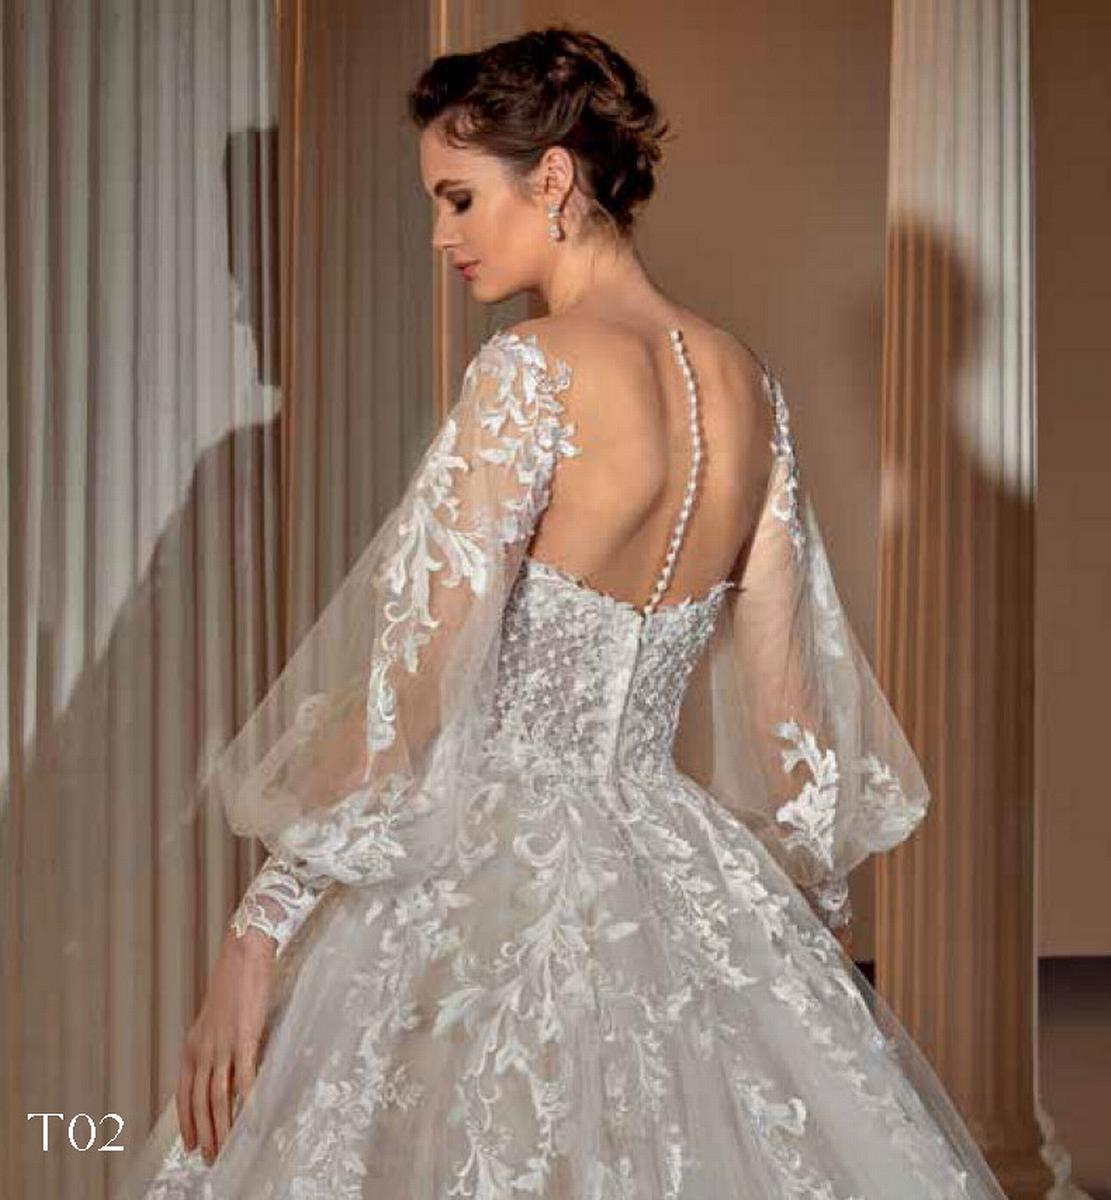 celli-spose-sposa-2022_DEMETRIOS-SPIRAL-1151-05